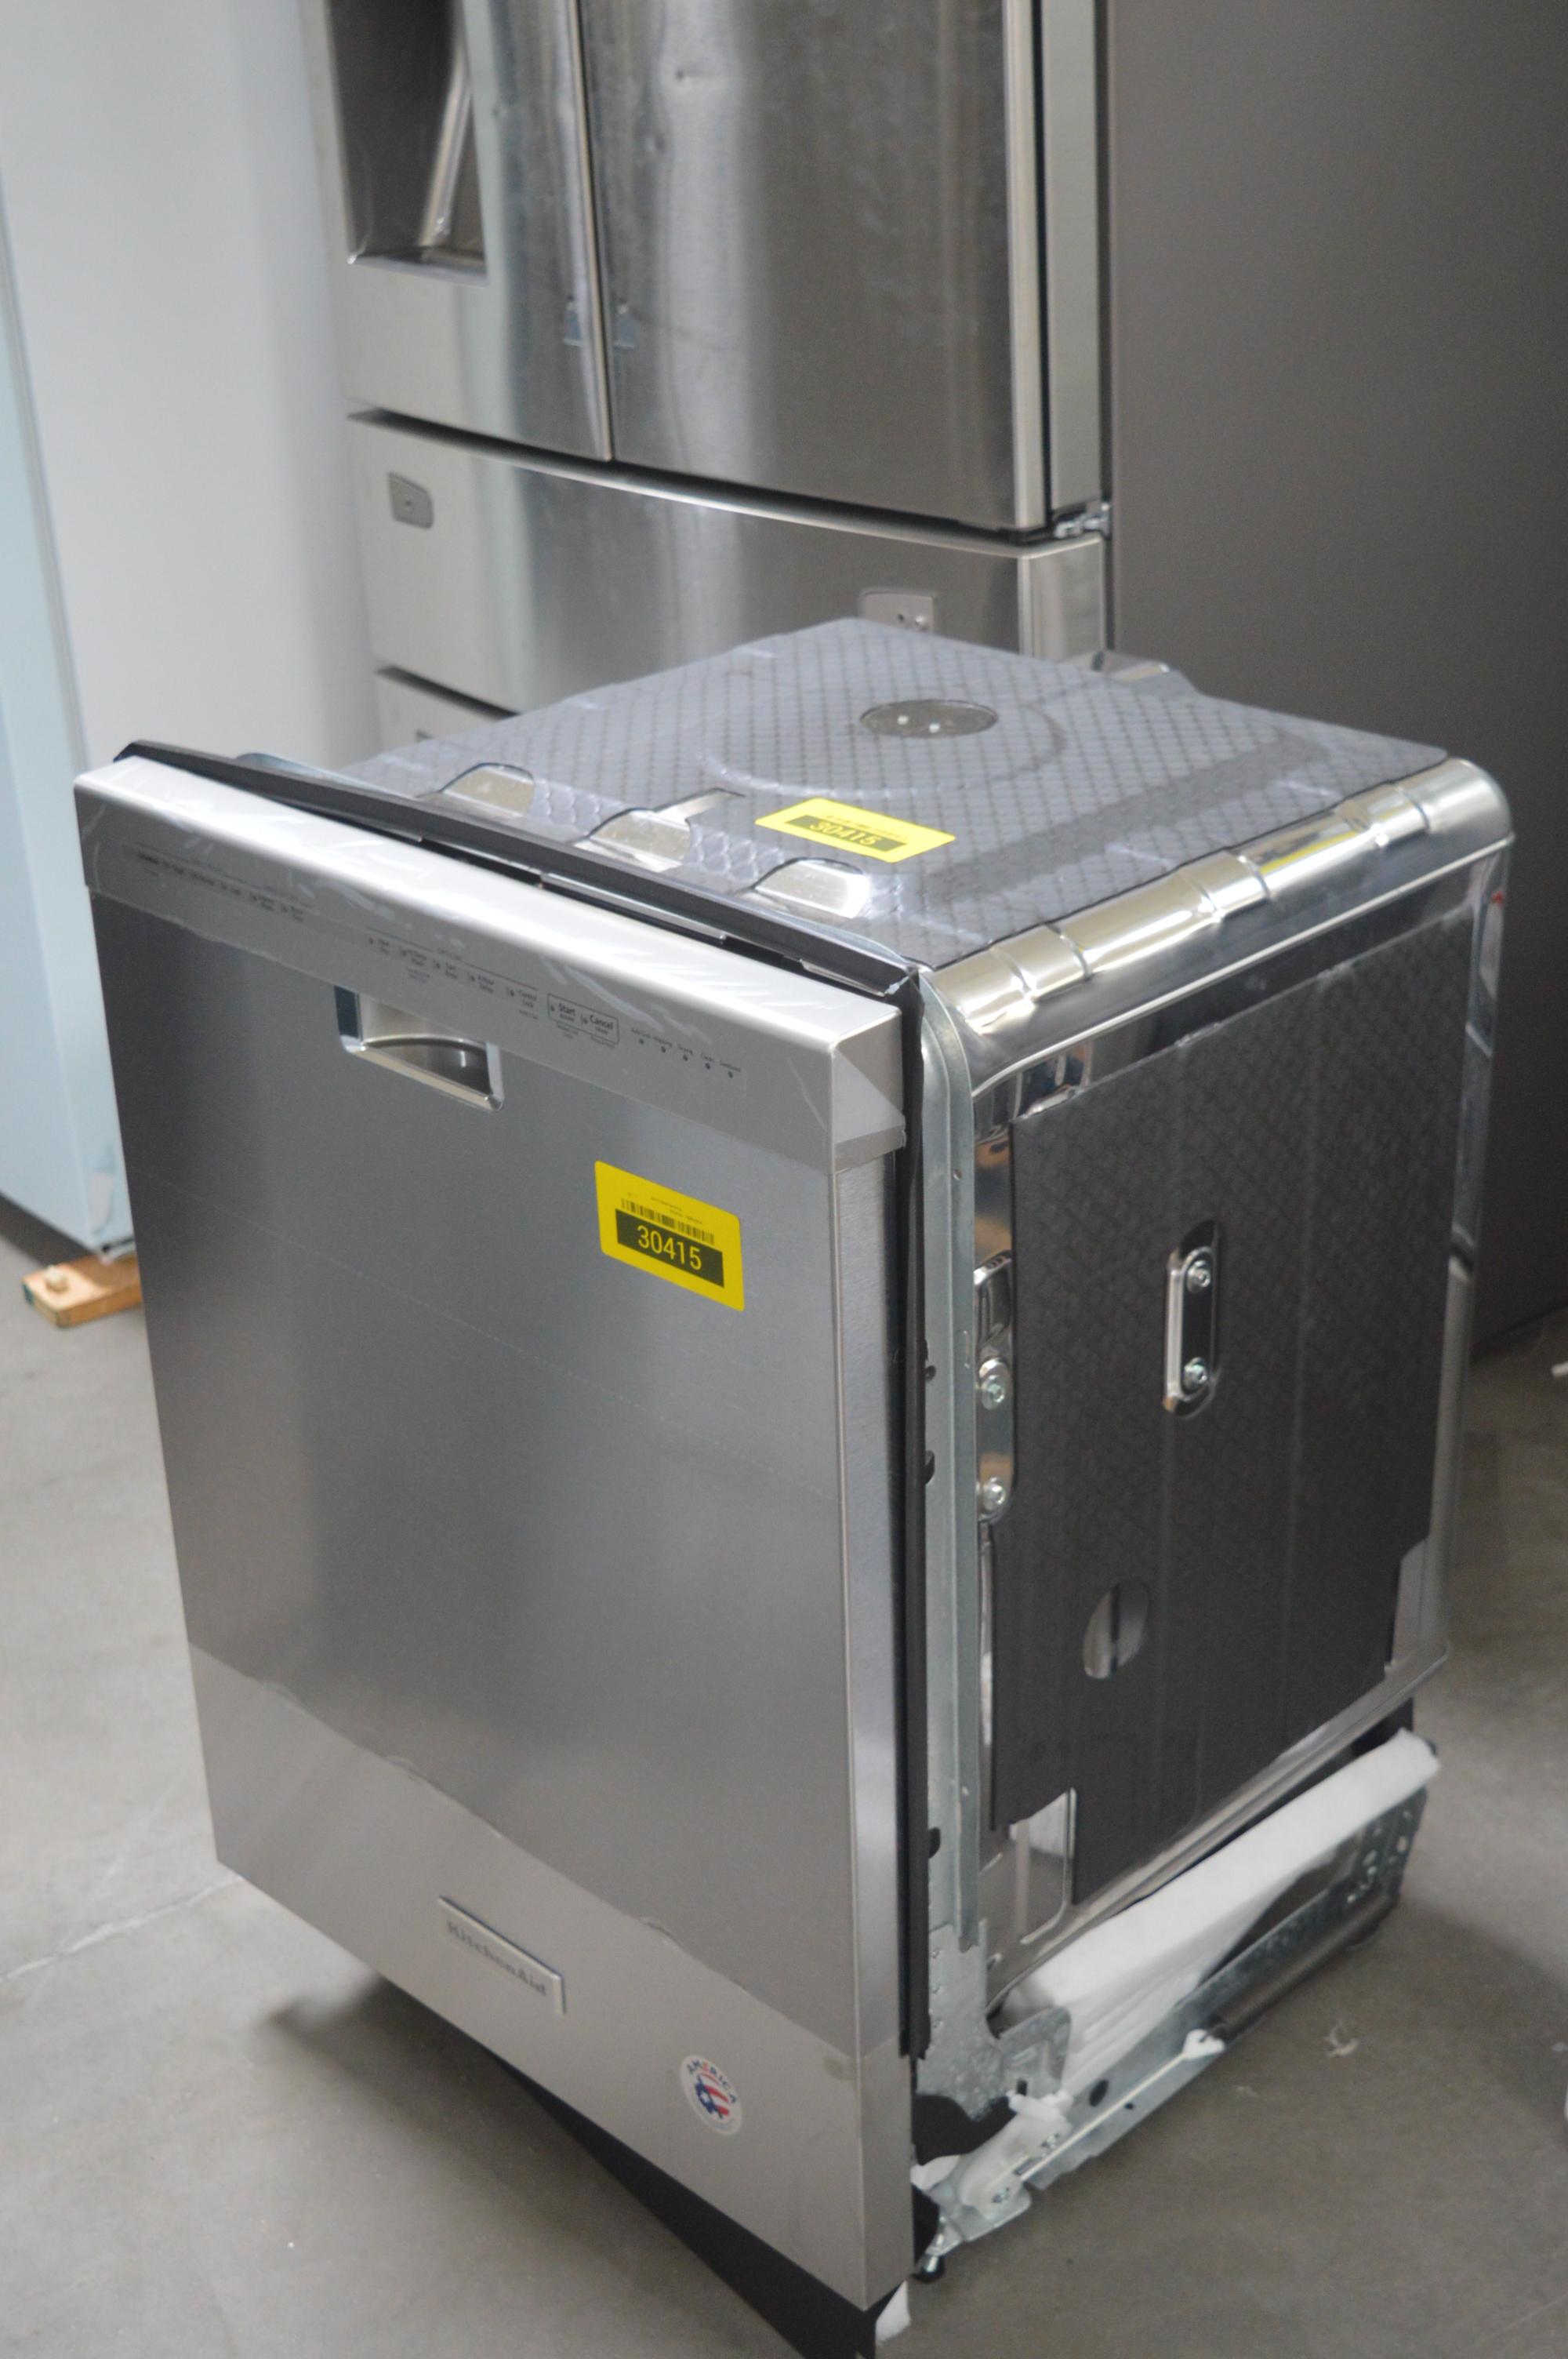 KitchenAid KDFE104DSS Full Console Dishwasher Stainless